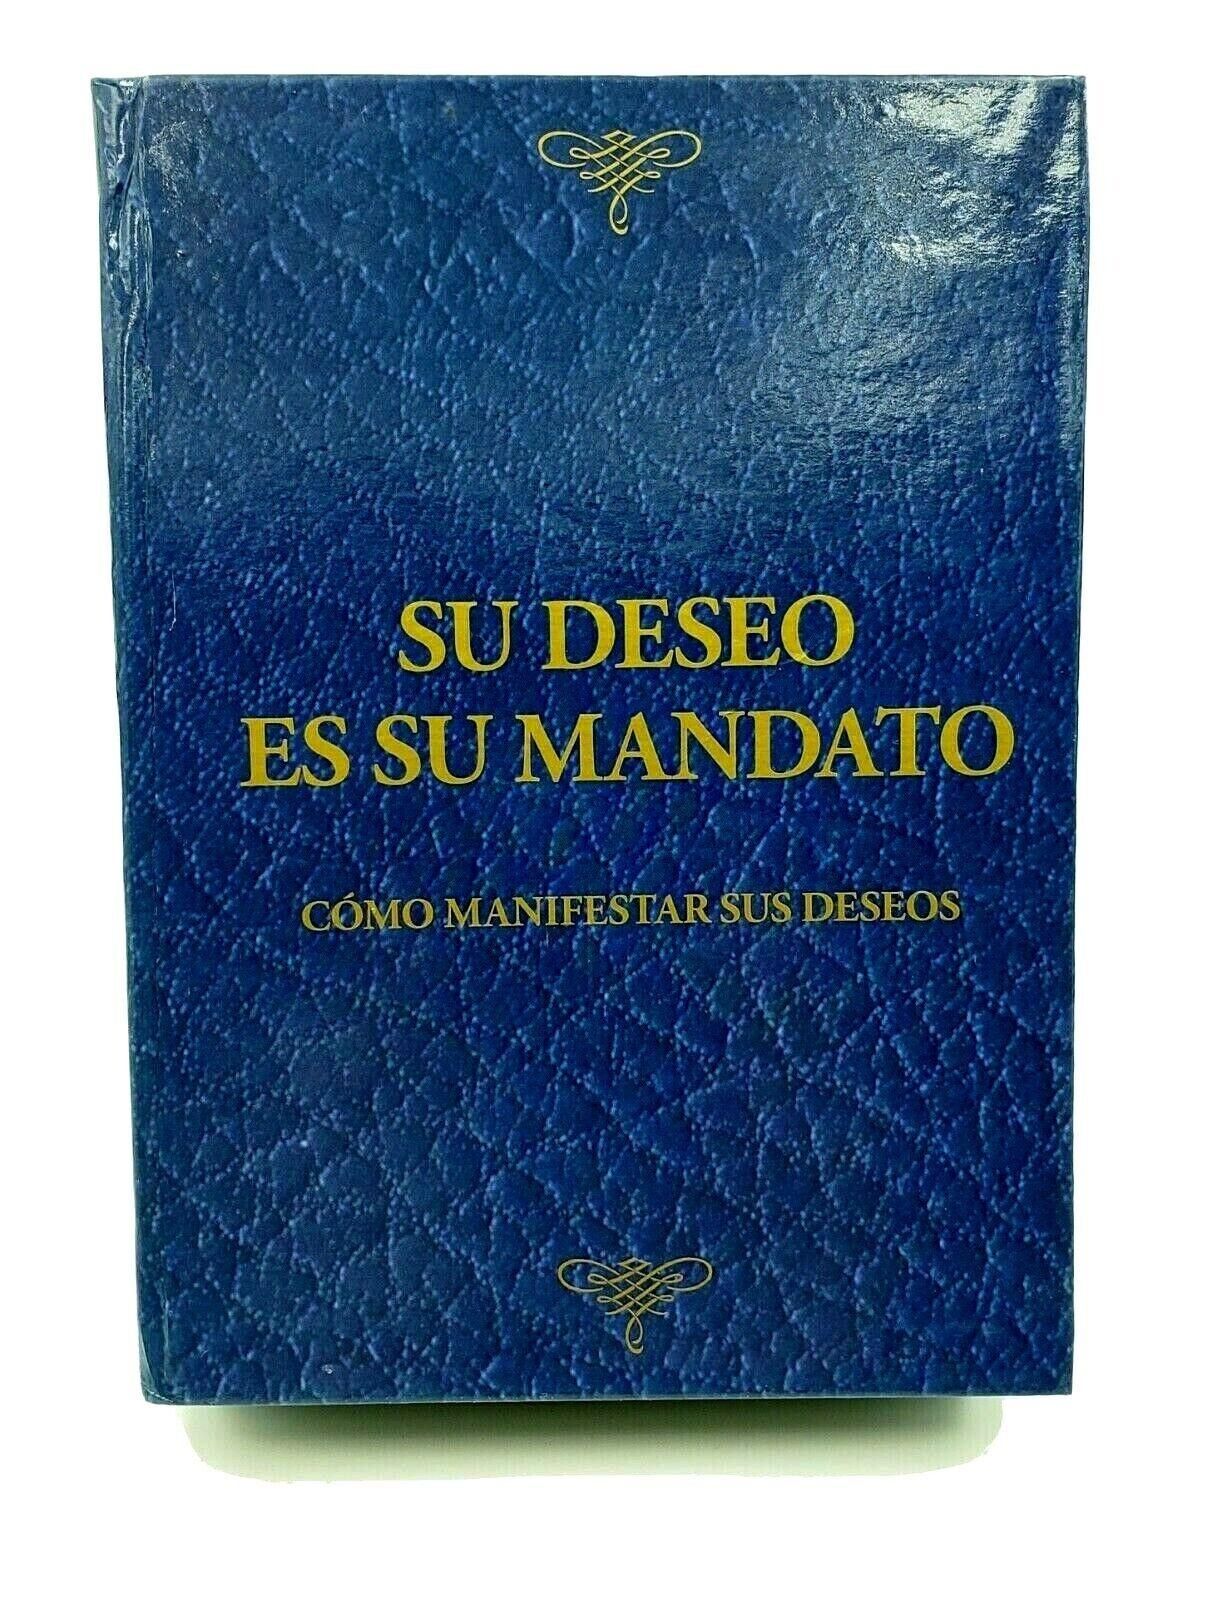 Su Deseo Es Su Mandato Your Wish Is Your Command, Audio CD Set Kevin Trudeau New - $39.89